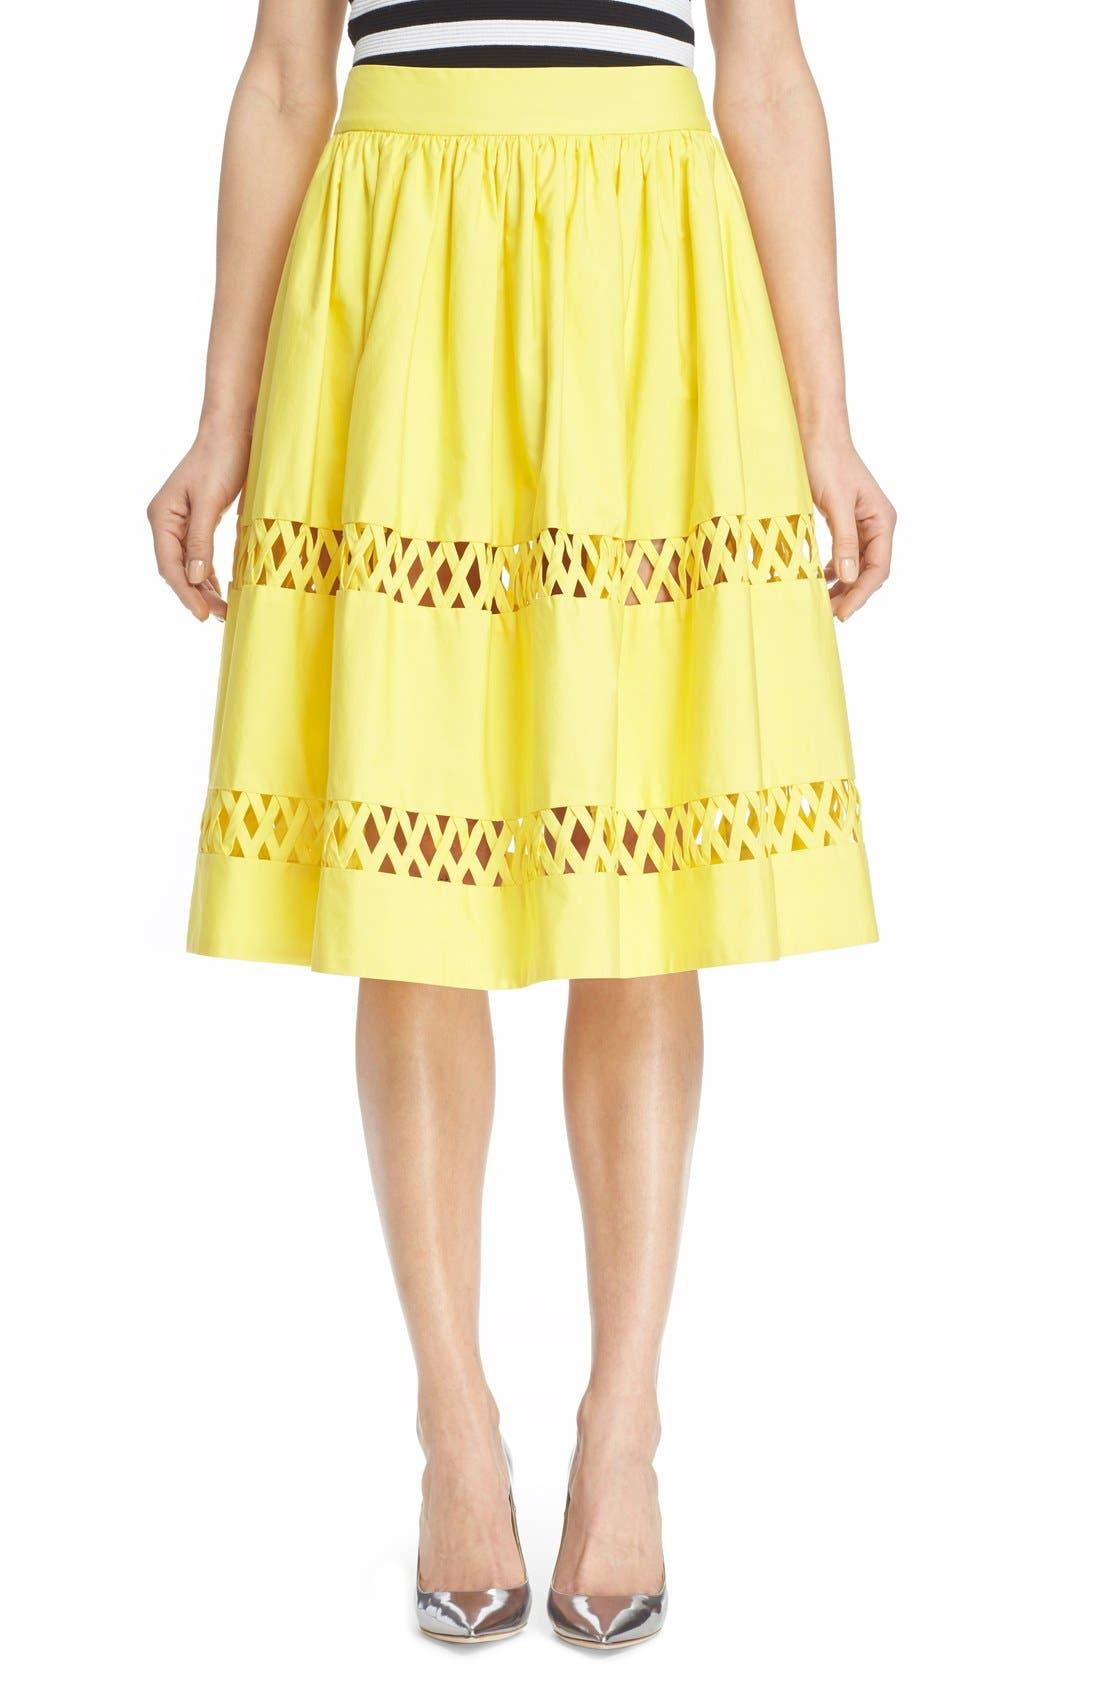 Alternate Image 1 Selected - Alice + Olivia 'Morina' Lattice Trim Cotton Skirt